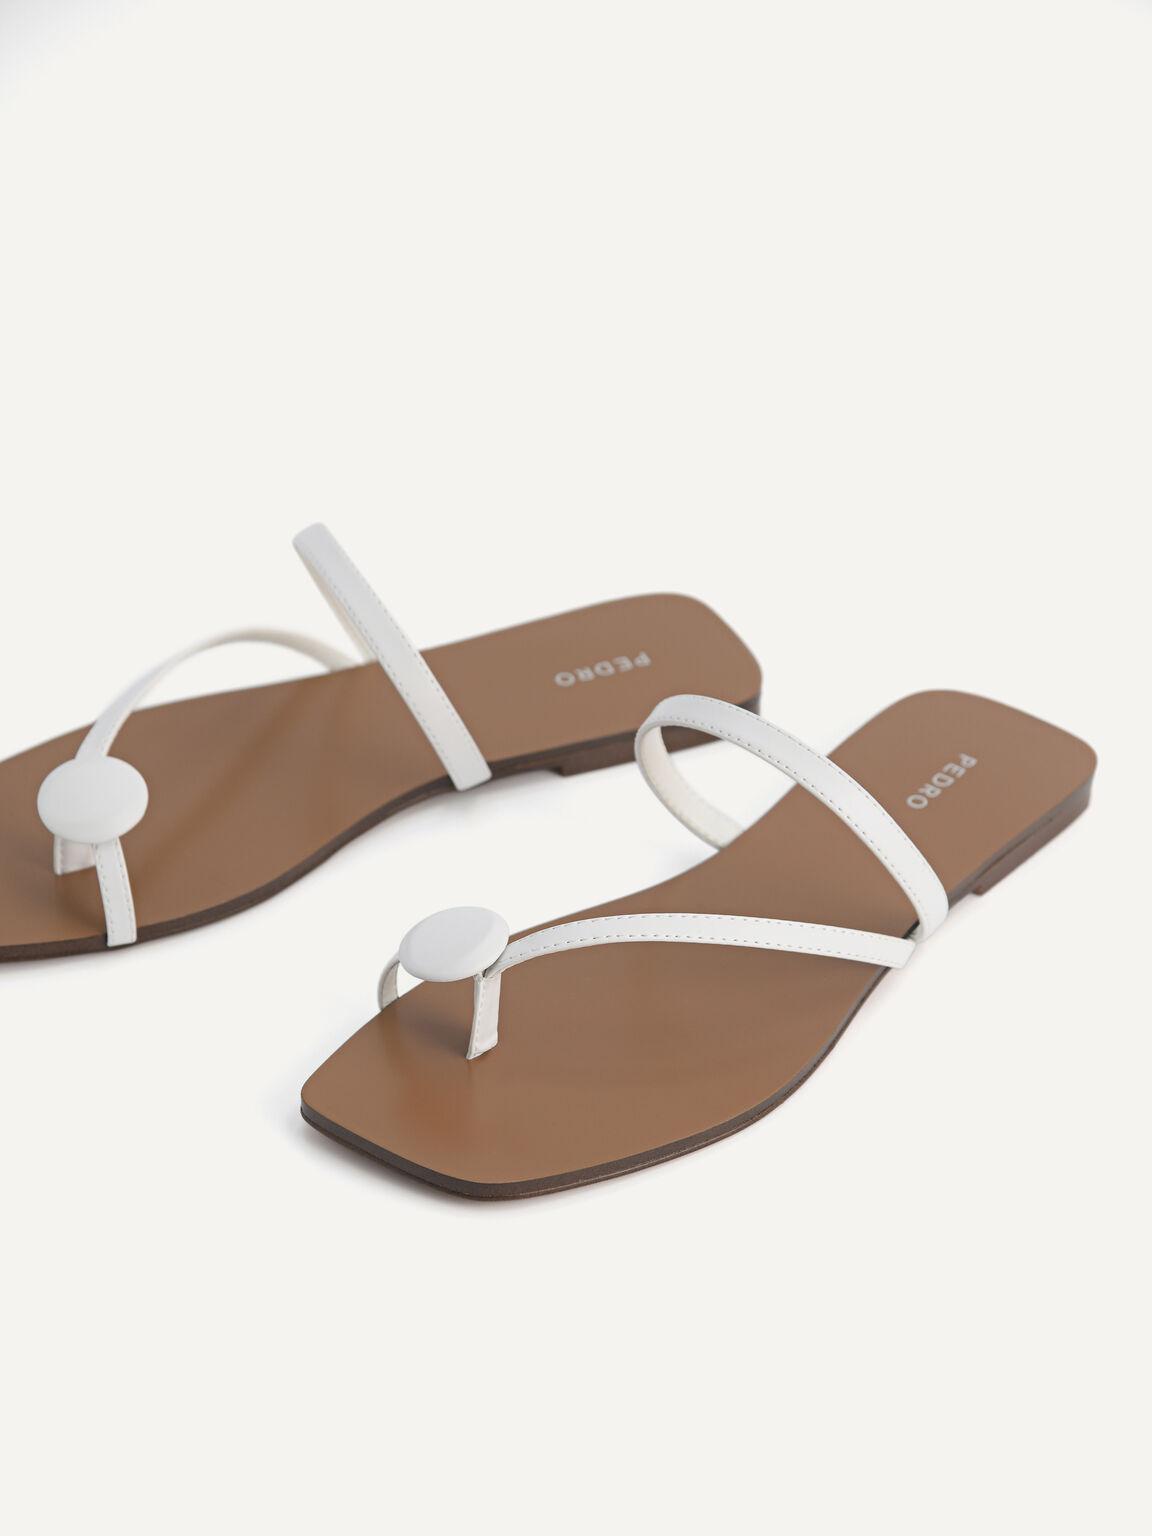 Toe Loop Sandals, White, hi-res